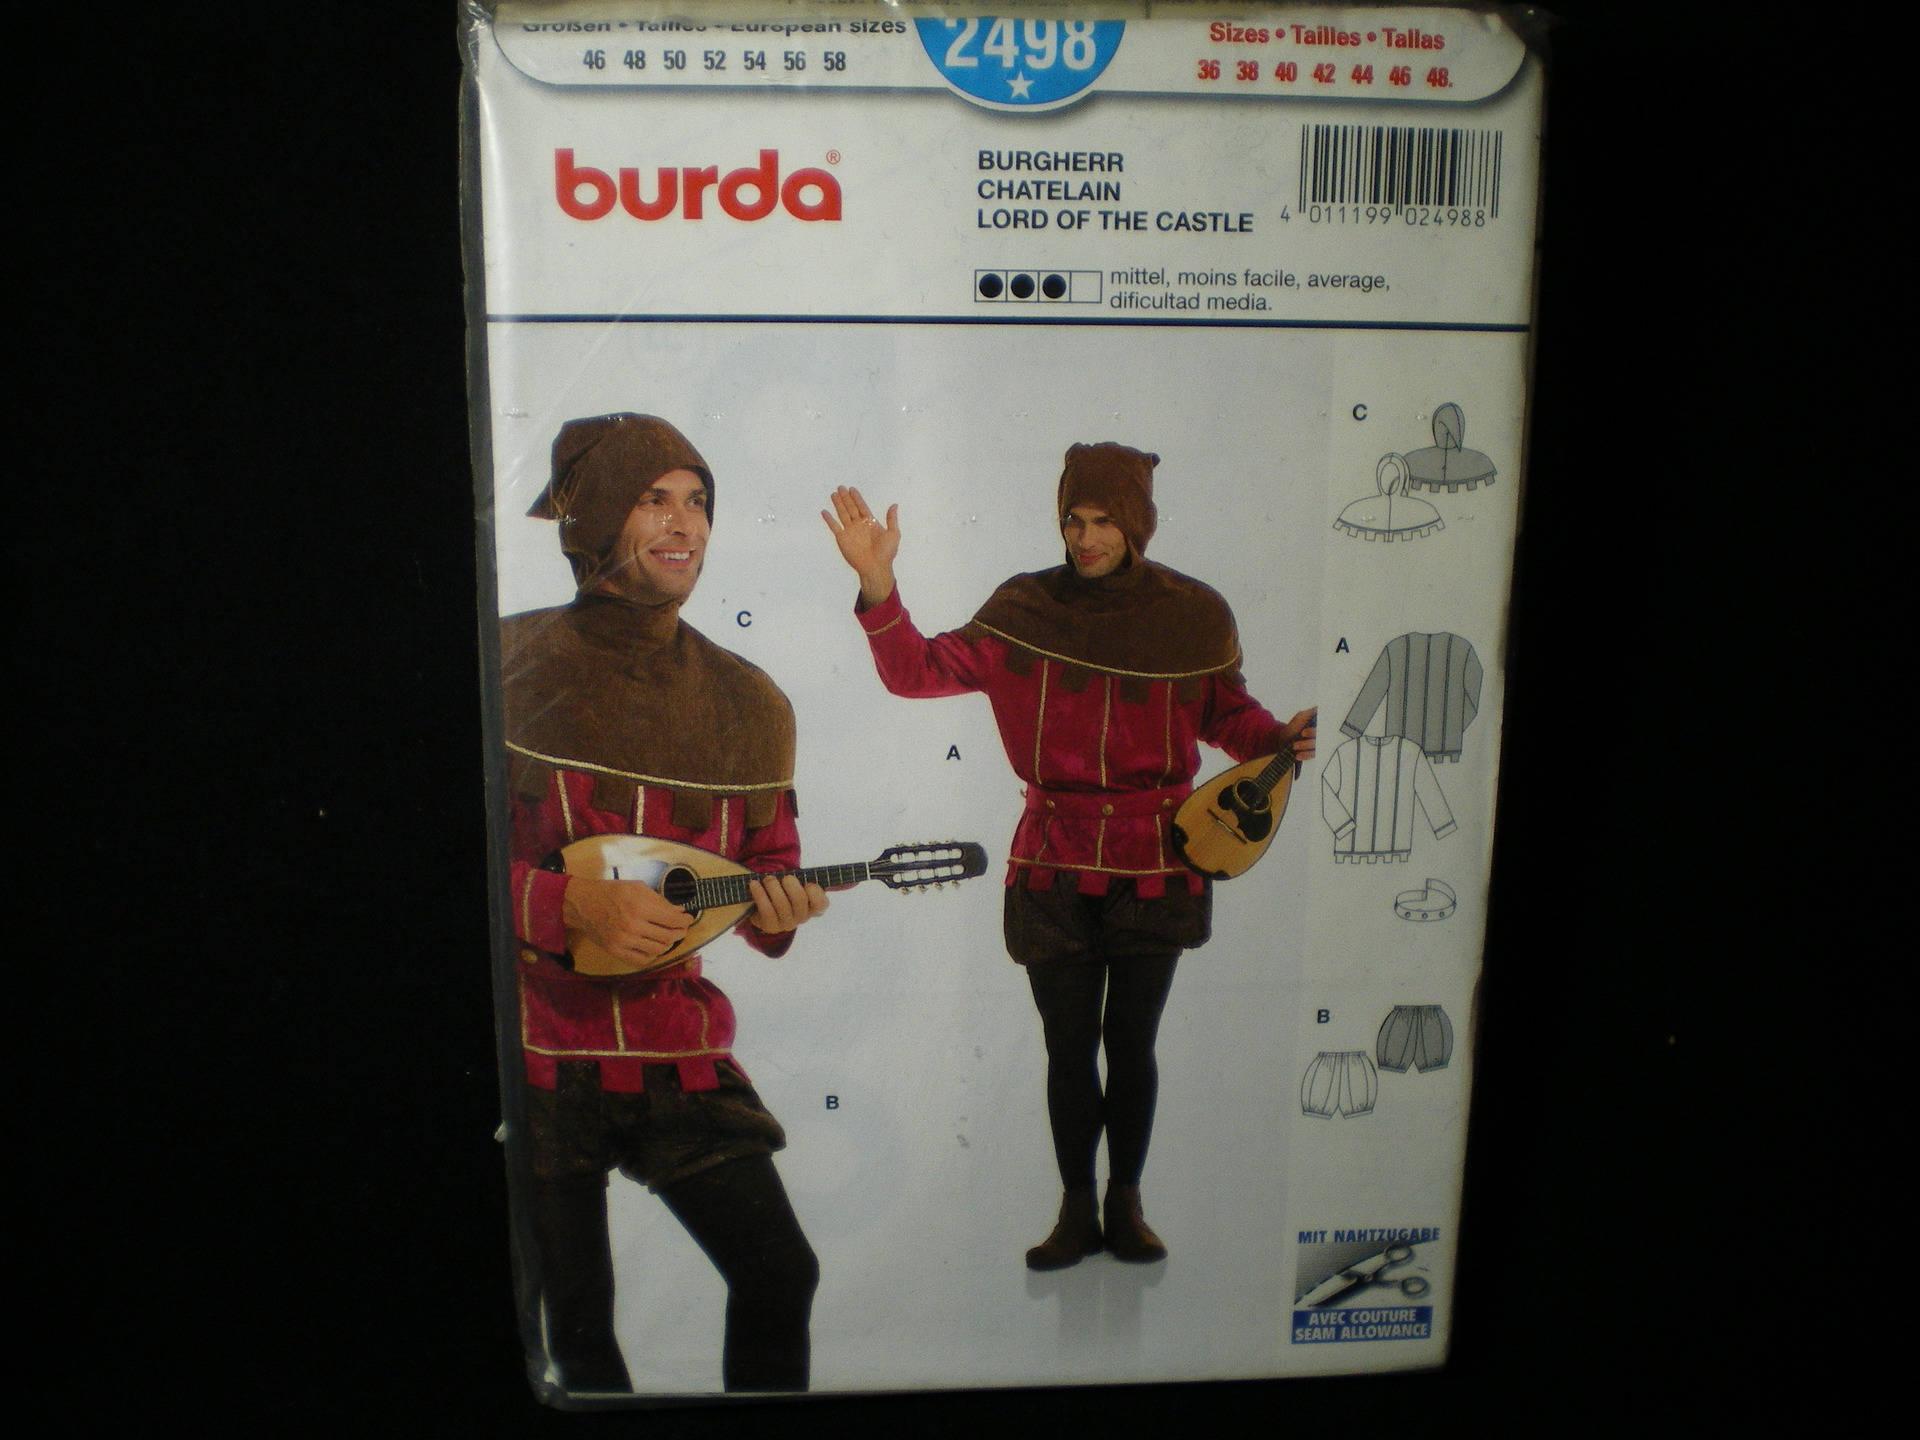 Patron Burda n° 2498 déguisement adulte chatelain